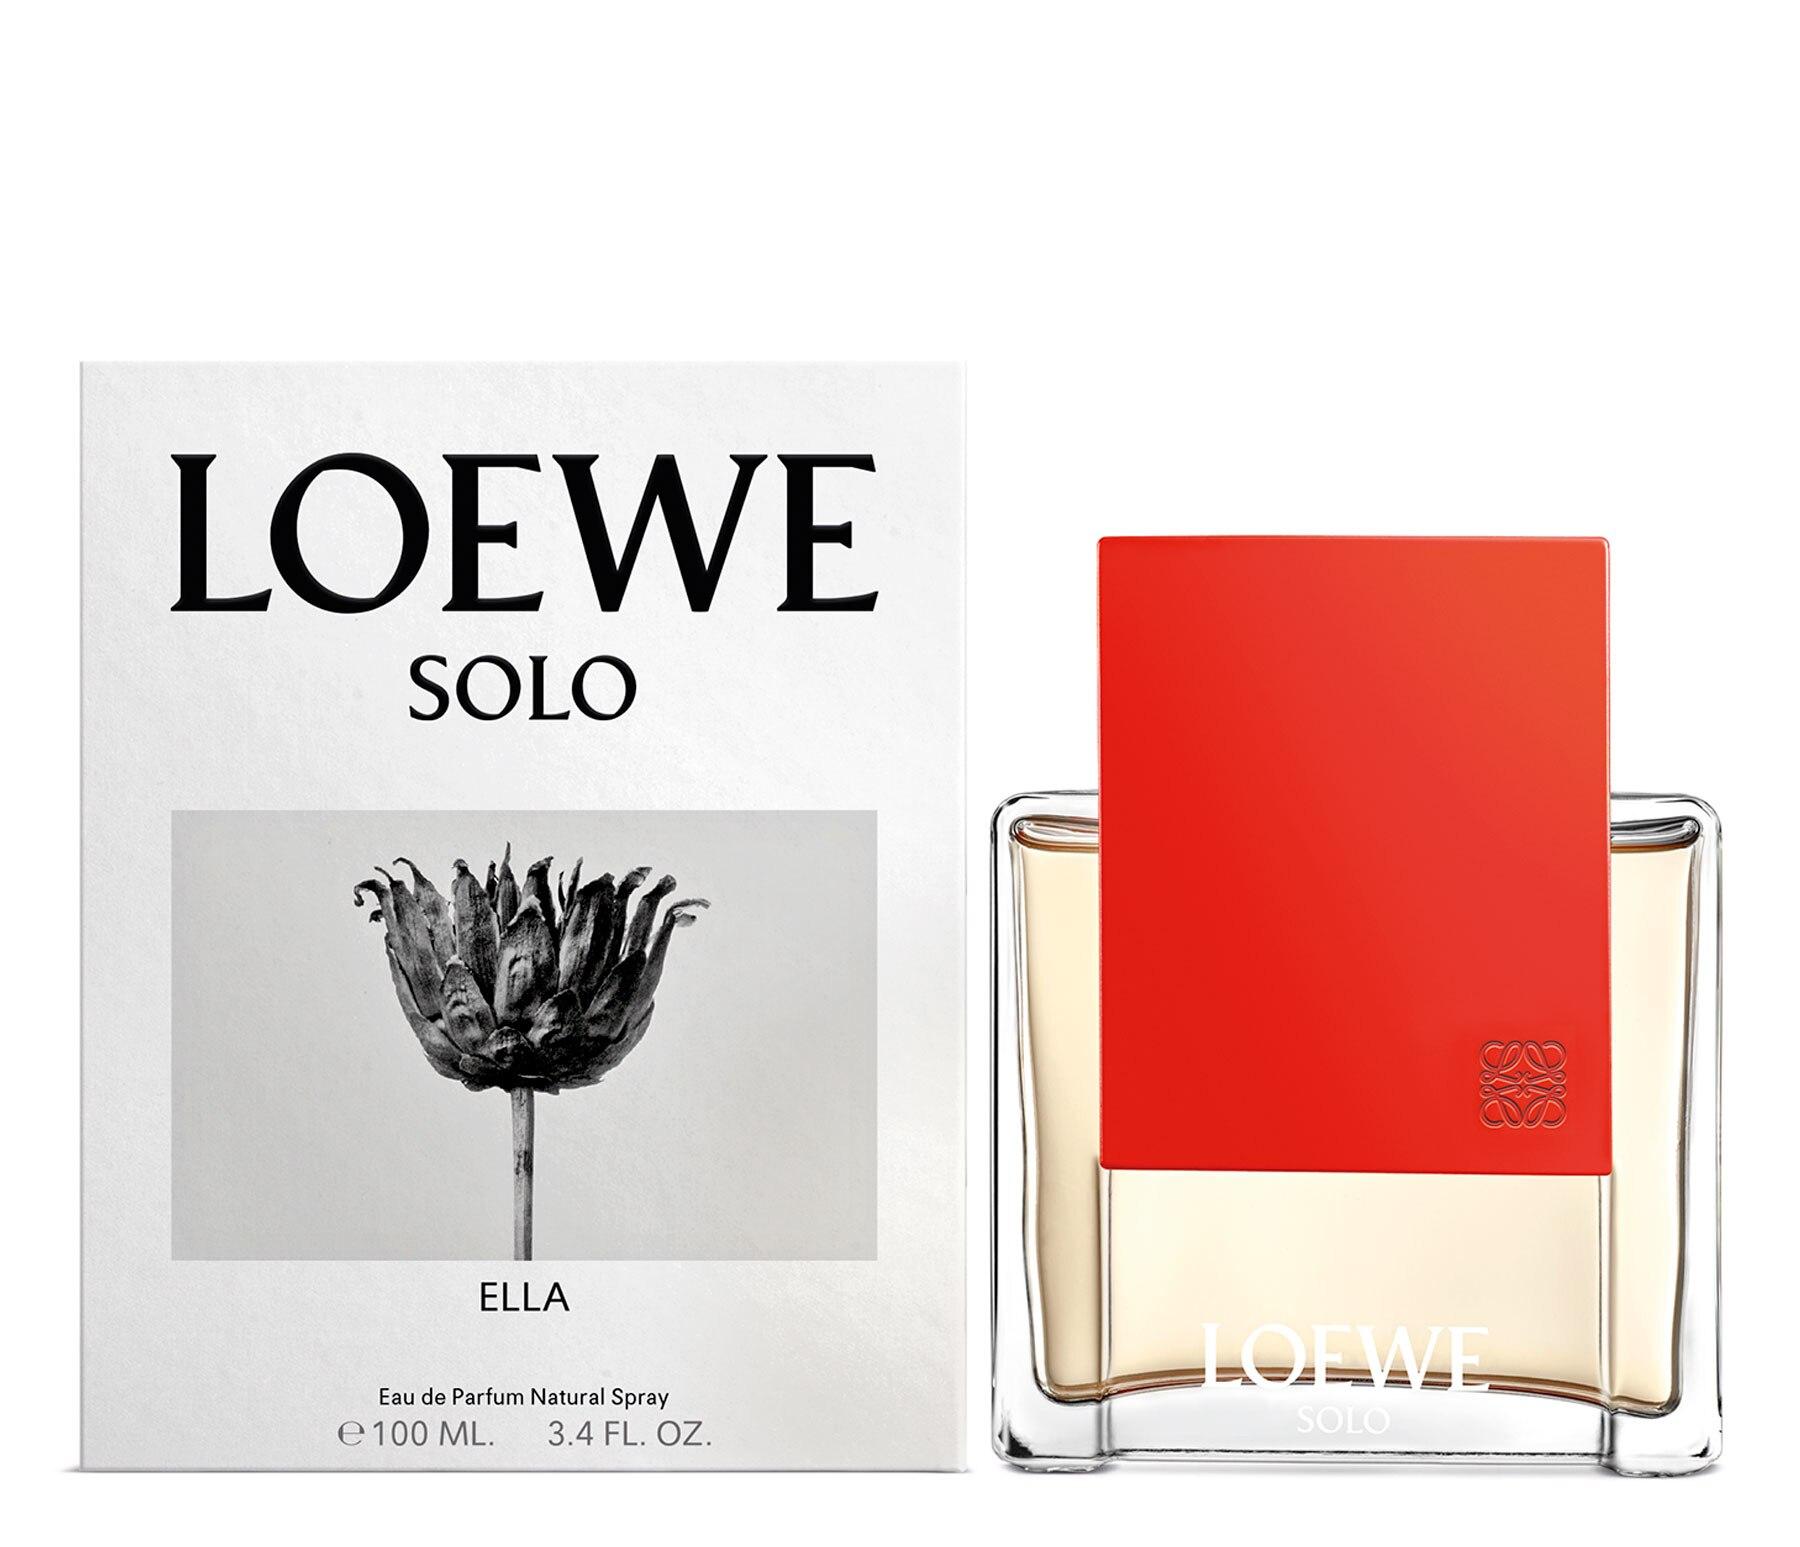 LOEWE SOLO ELLA EAU DE PARFUM 50ML